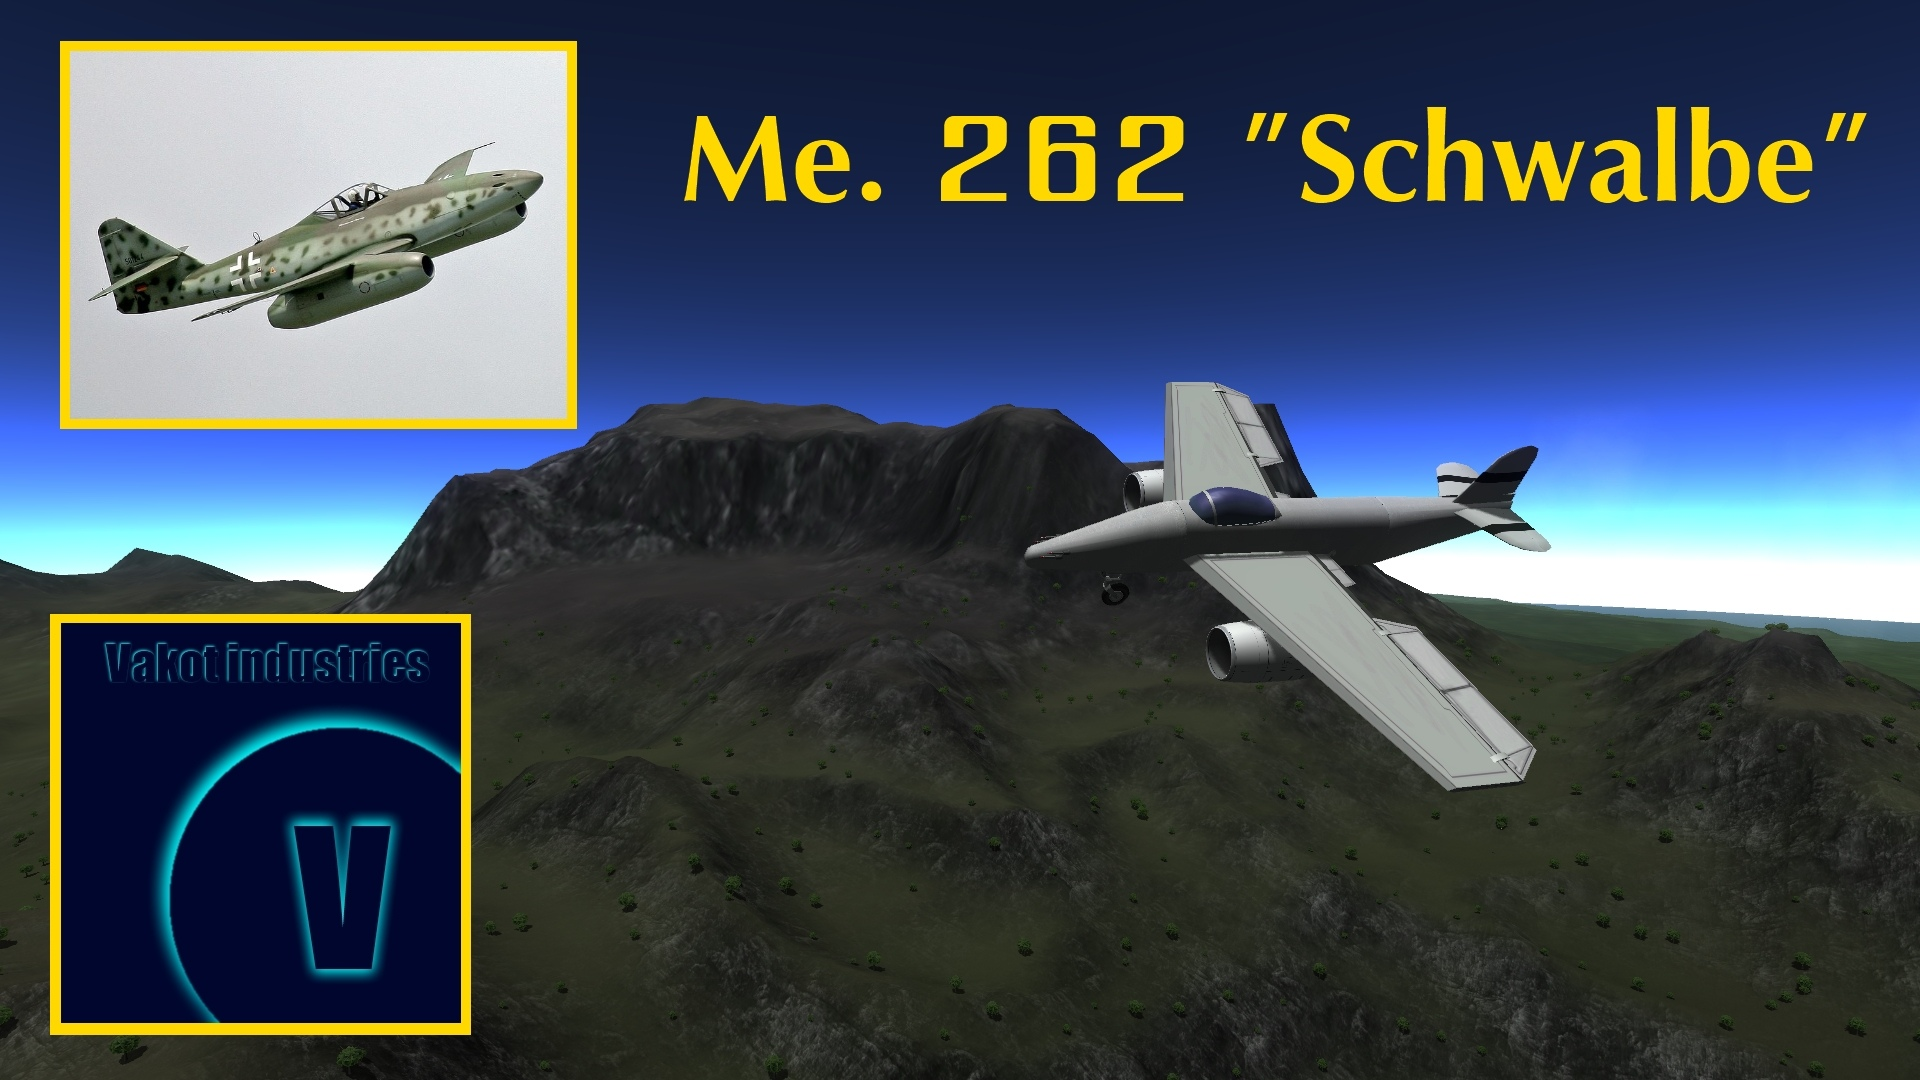 Me. 262